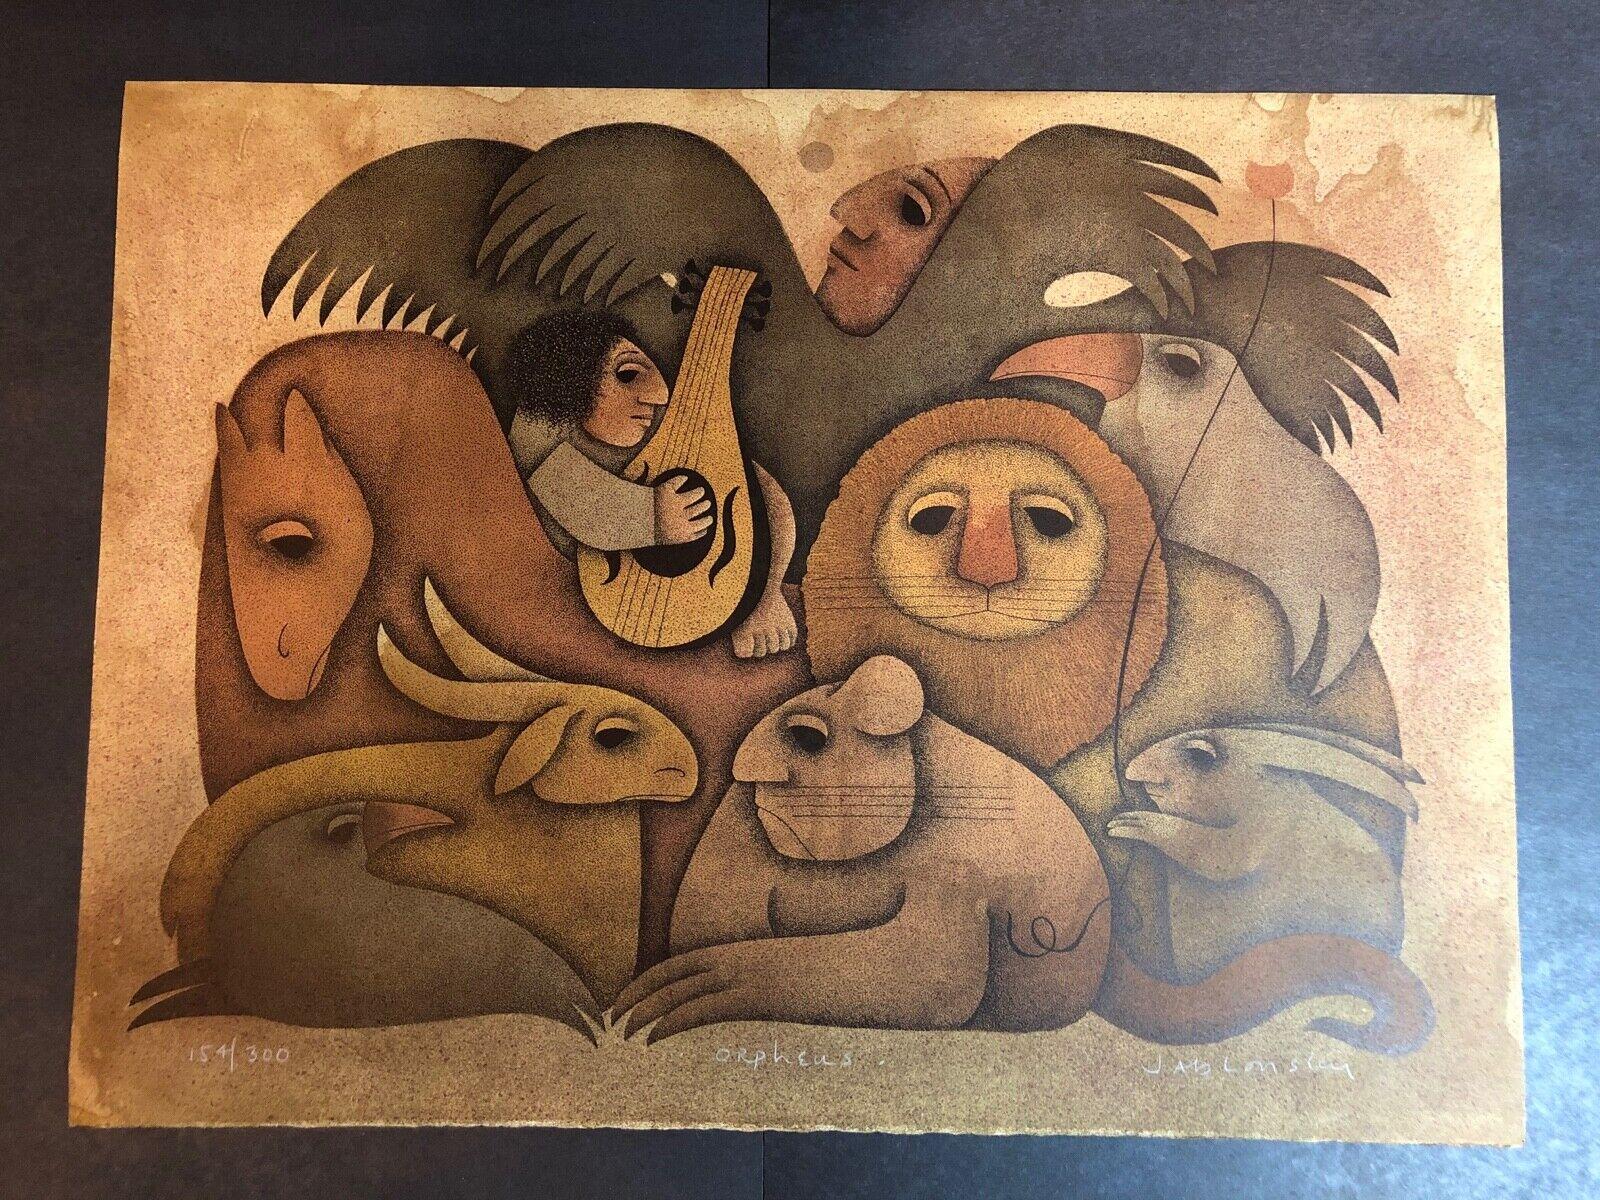 Carol Jablonsky Lithograph Art Print – Orpheus Limited Edition 154/300 Art